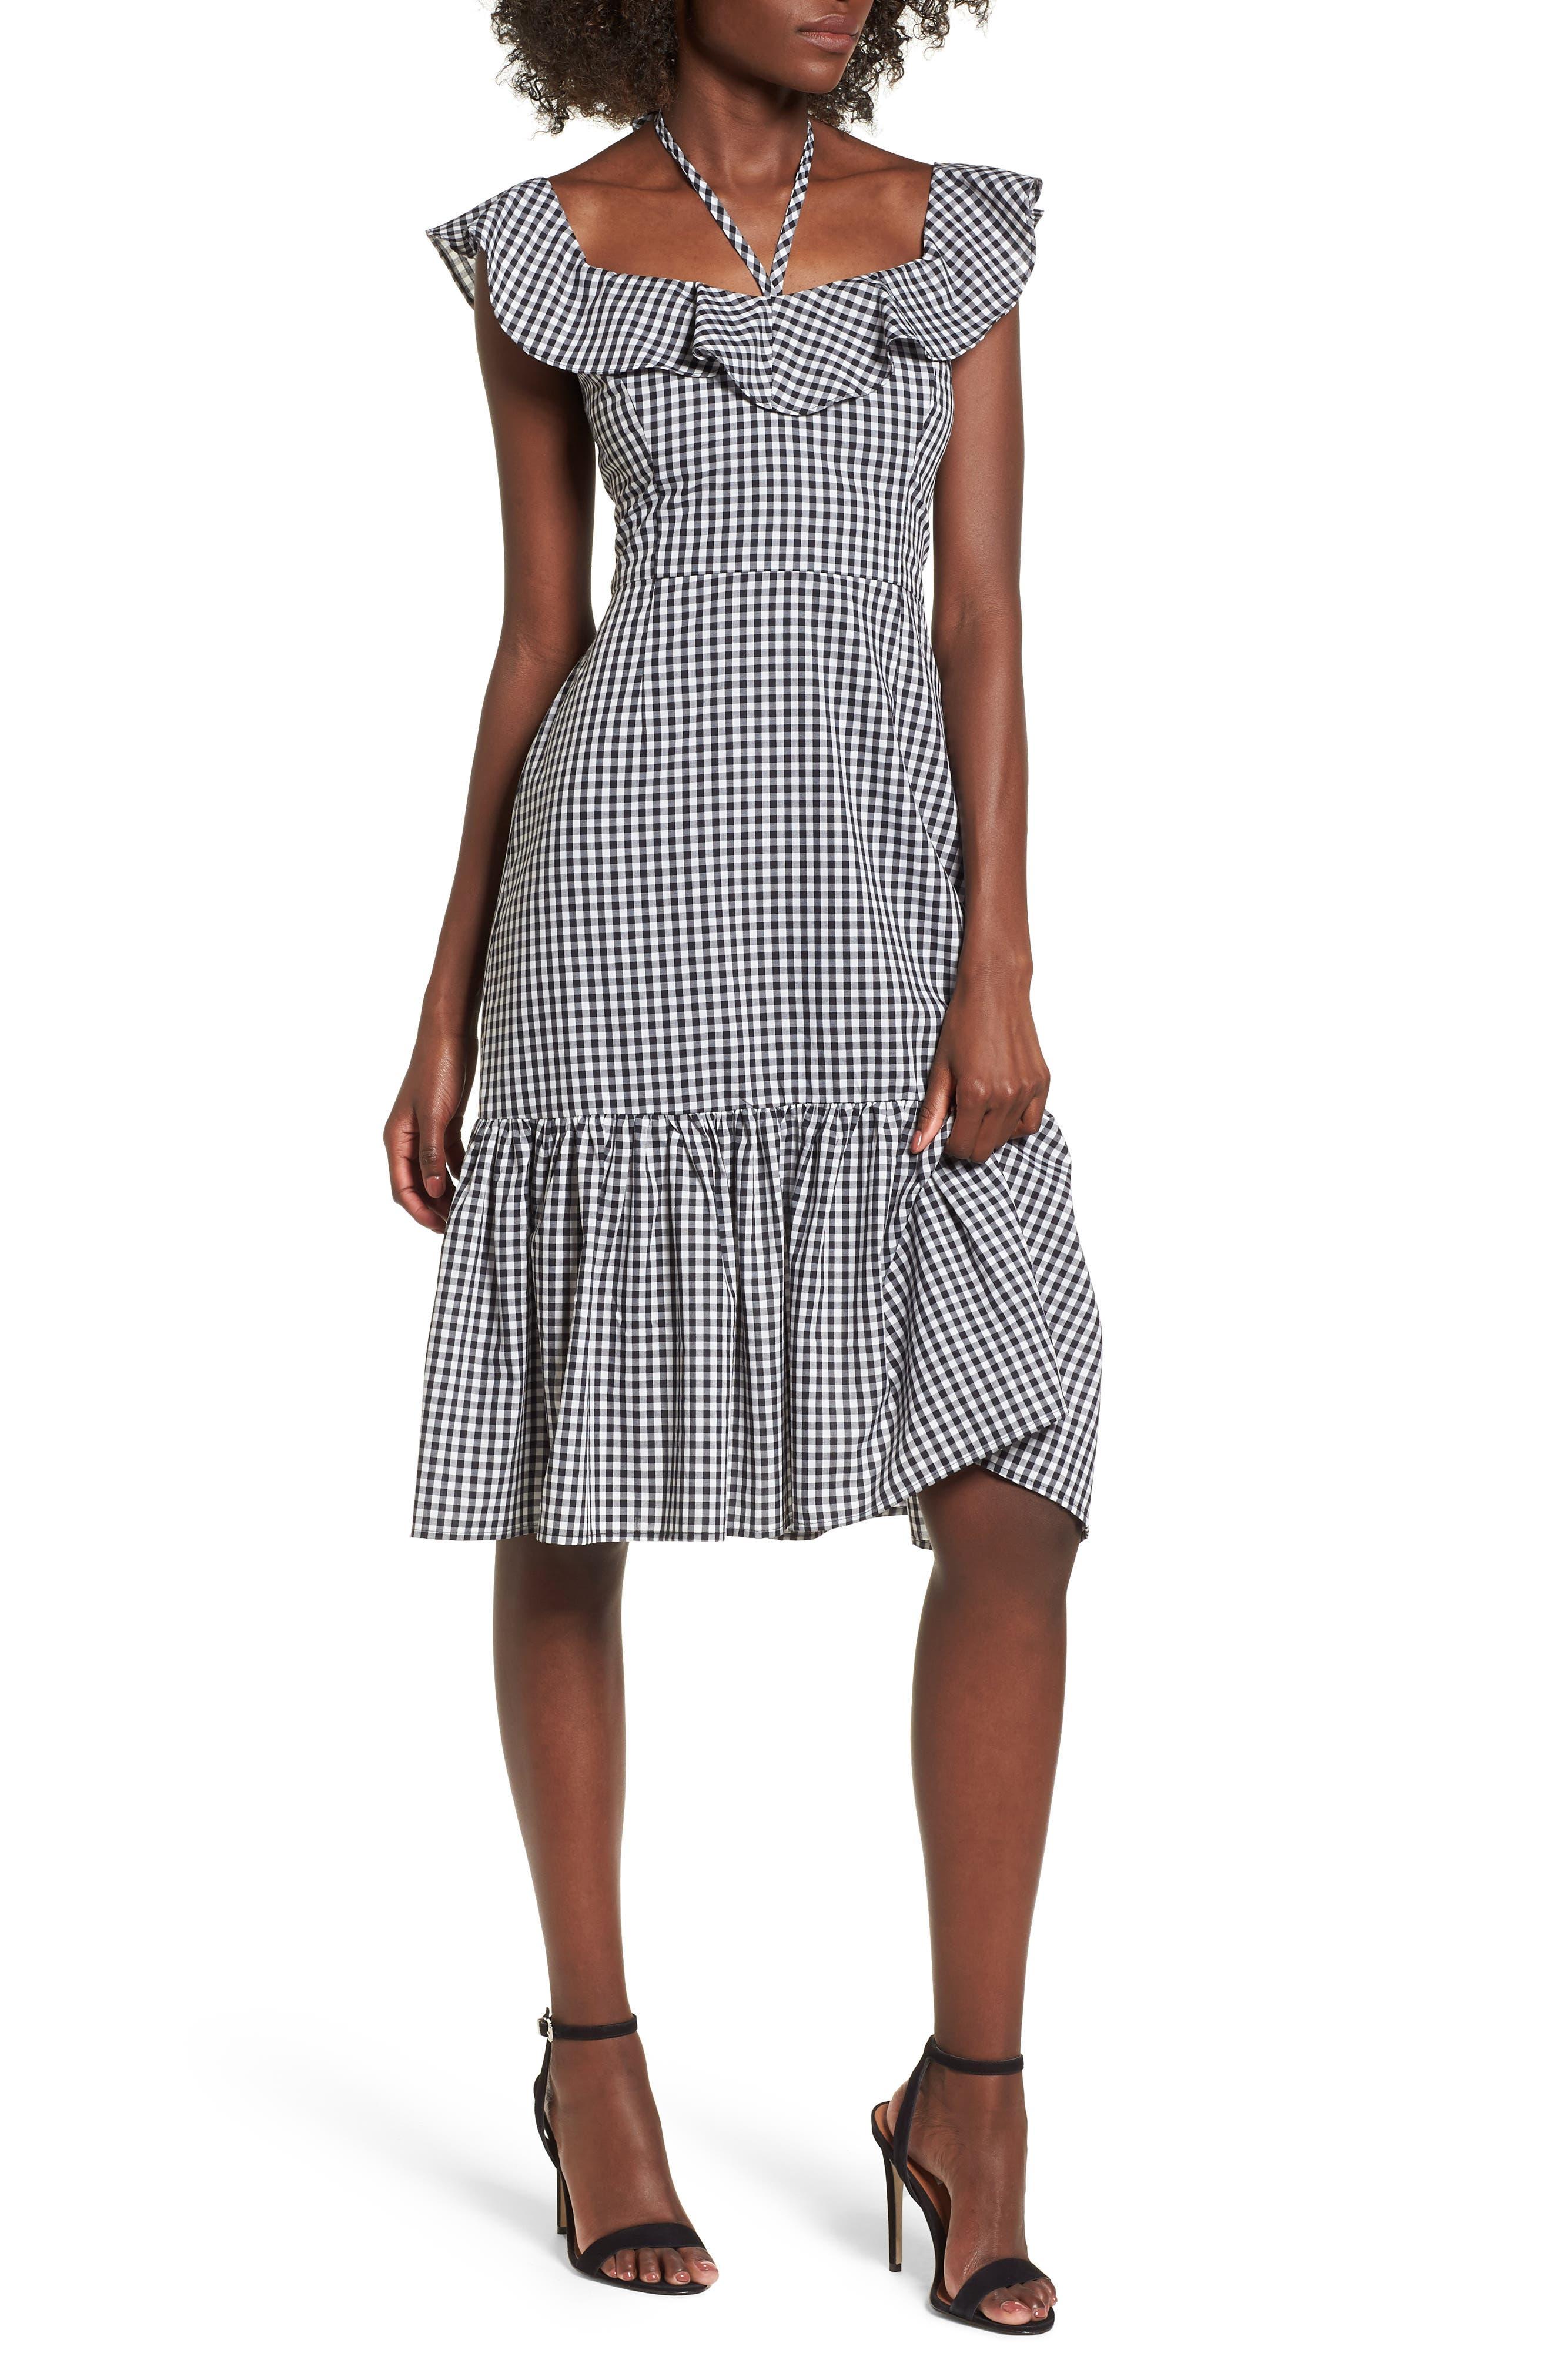 Zander Ruffle Midi Dress,                             Main thumbnail 1, color,                             001